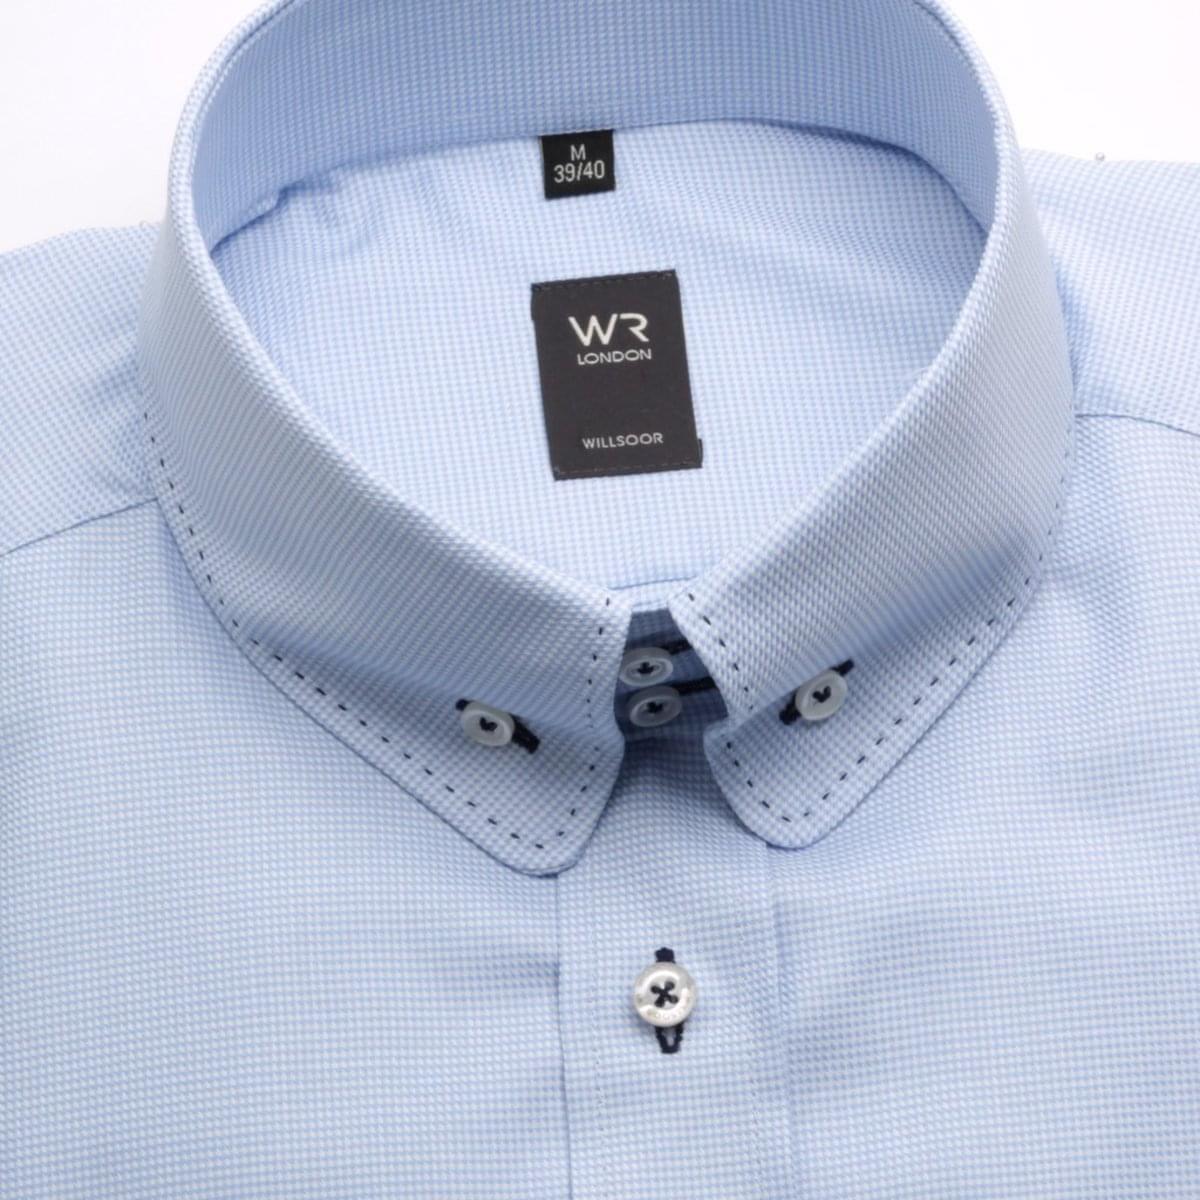 Willsoor Pánská košile WR London (výška 176-182) 1938 176-182 / L (41/42)